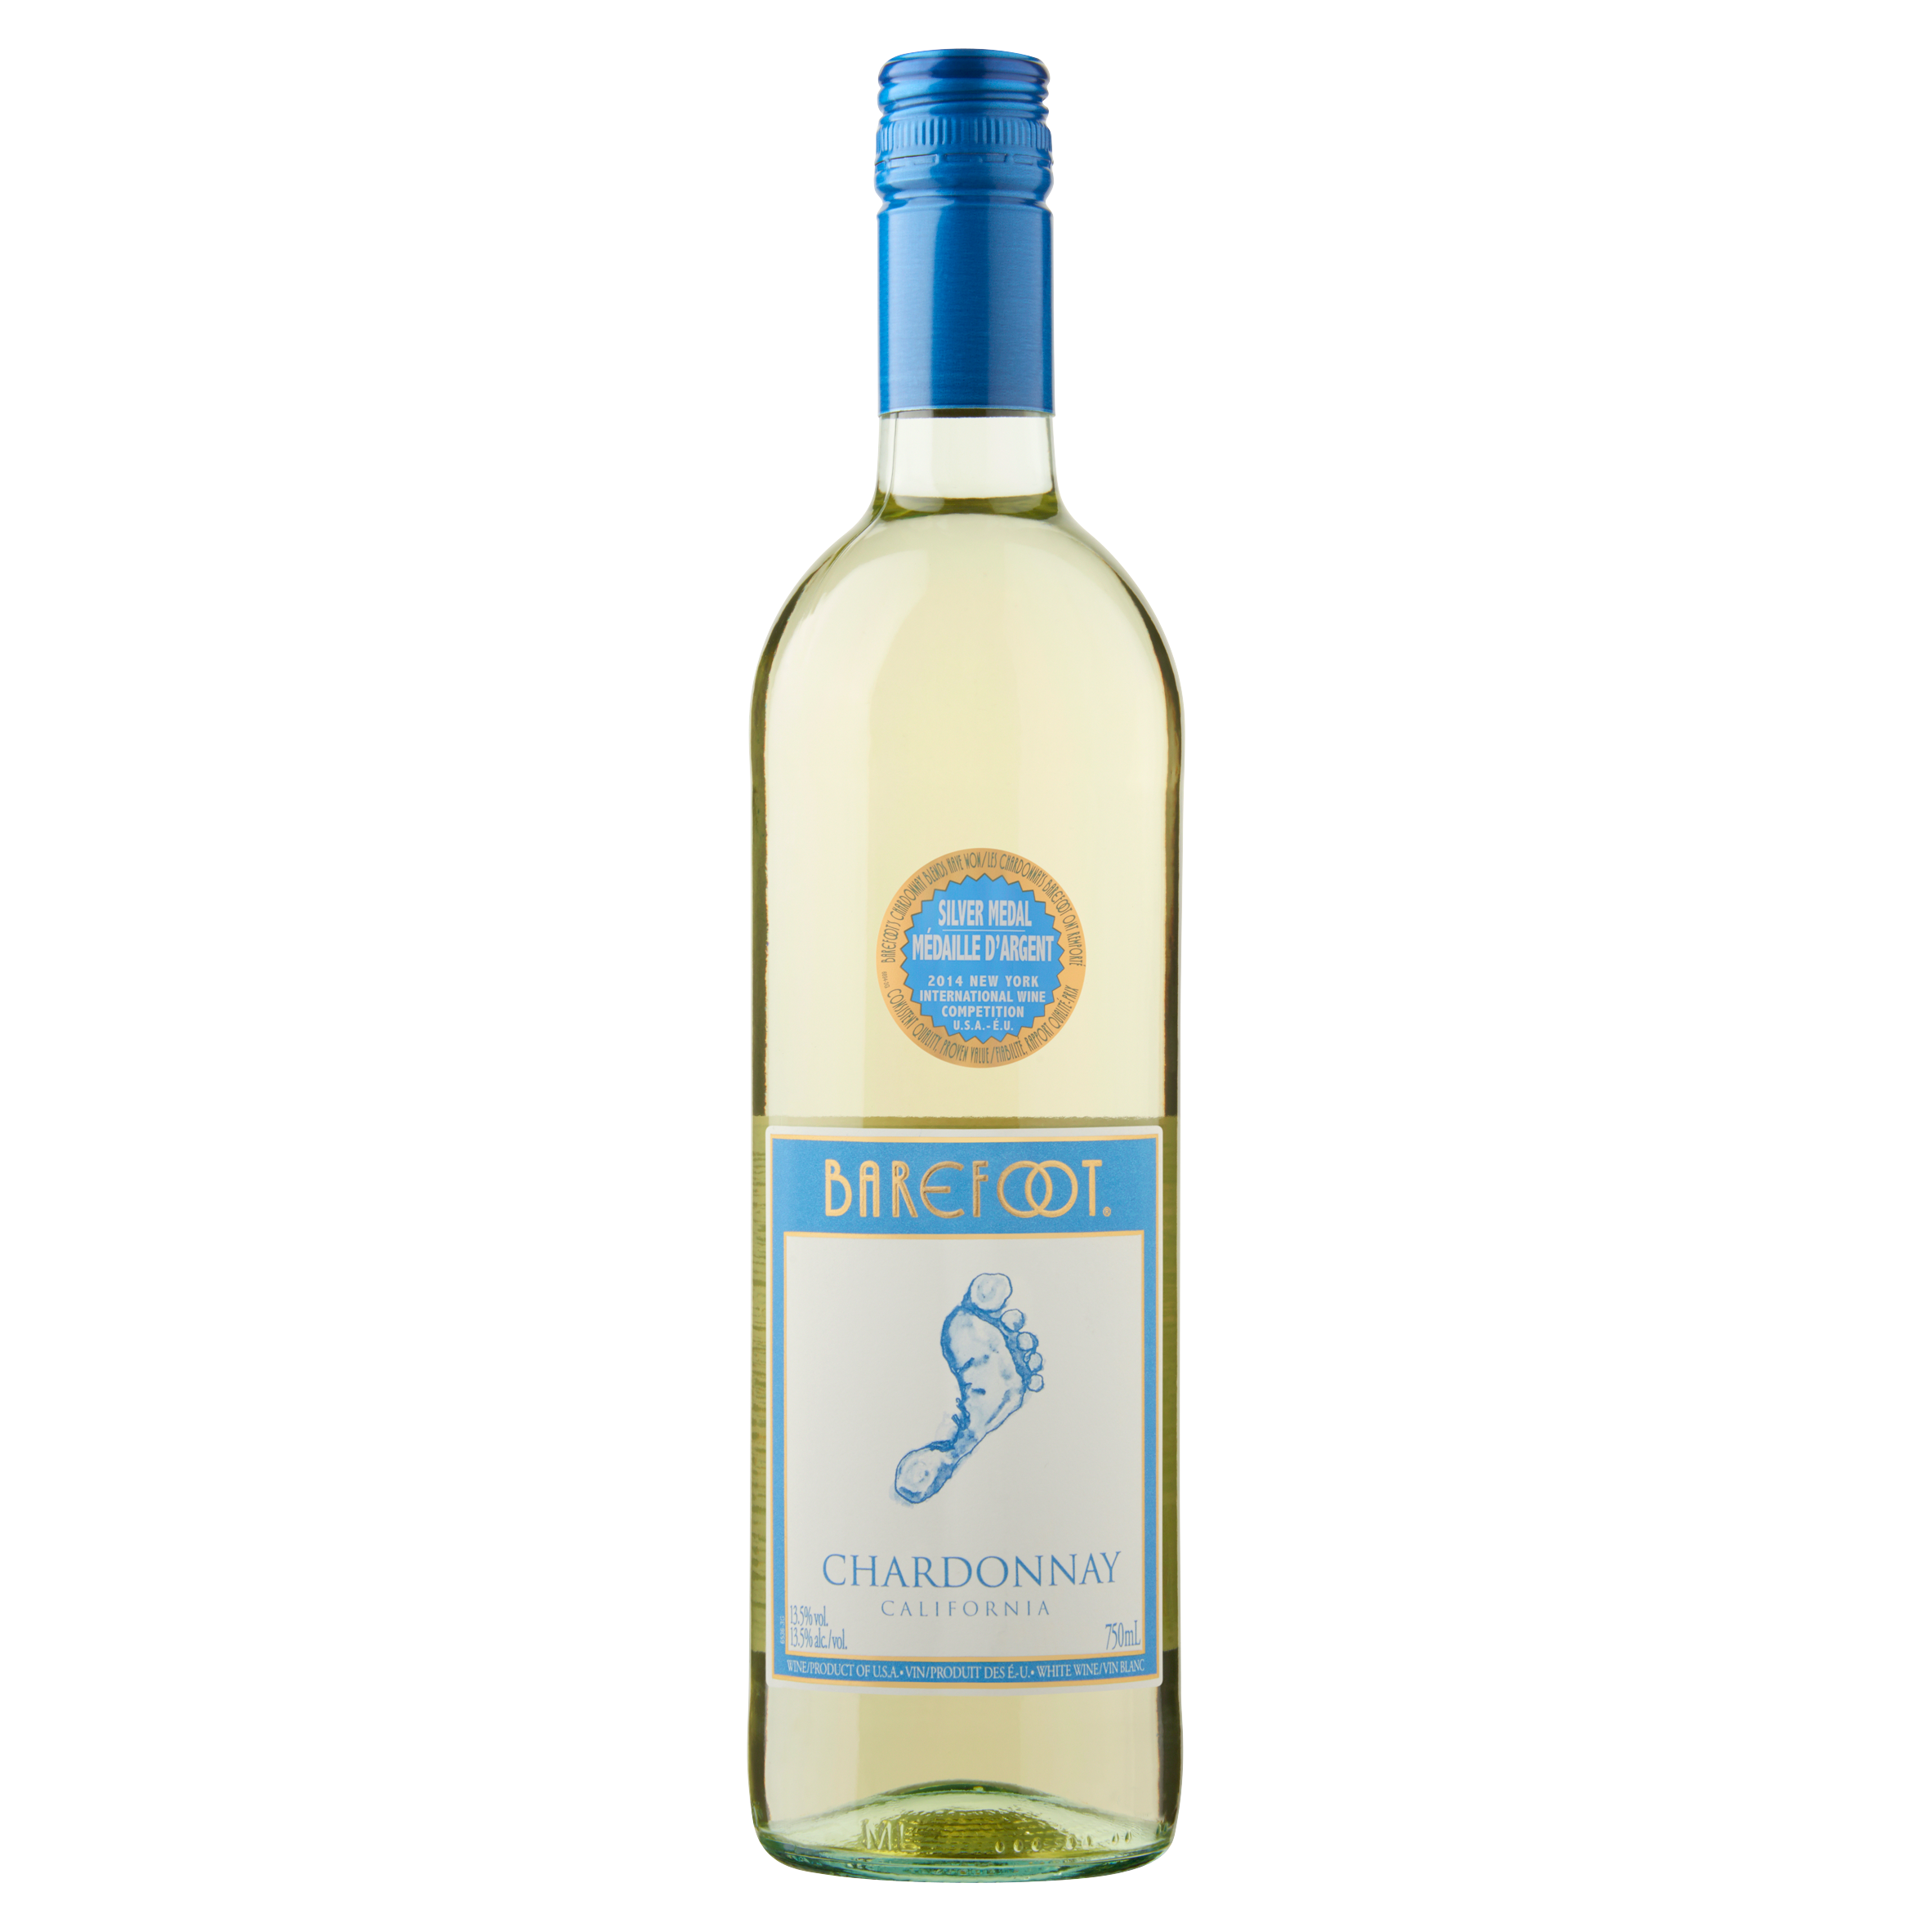 Barefoot Chardonnay 750 ml